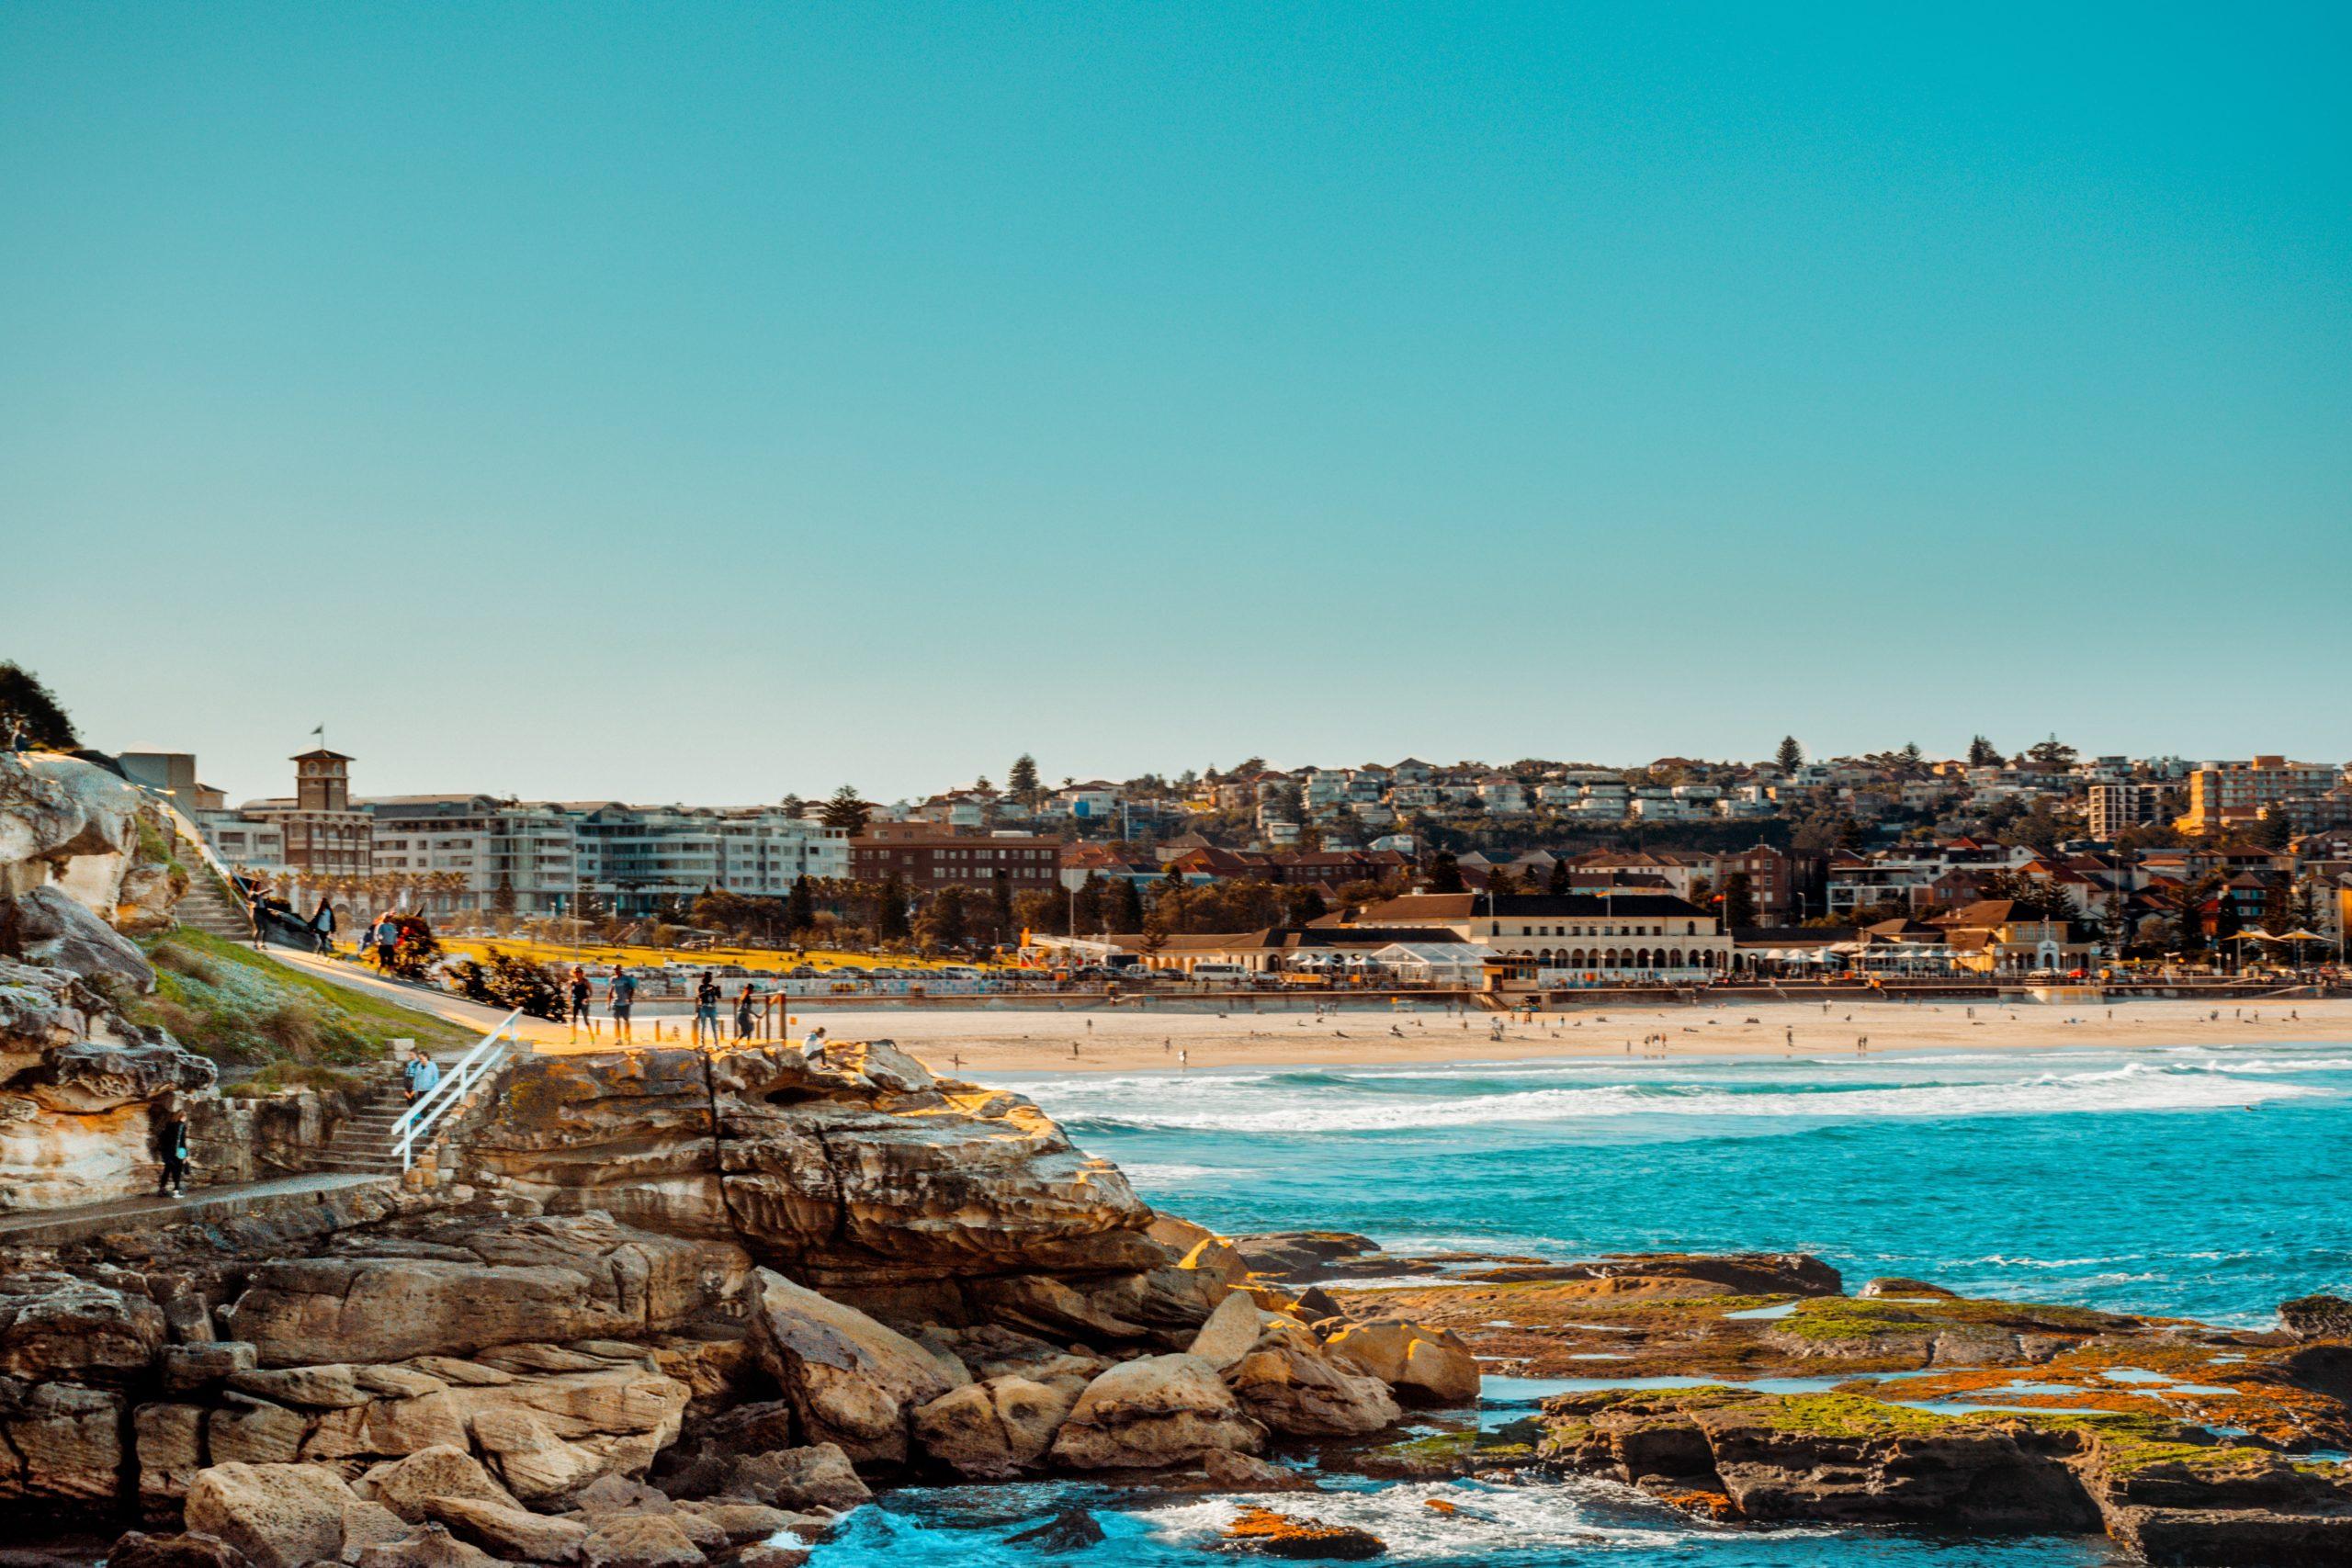 voyage sidney australie e visa 03